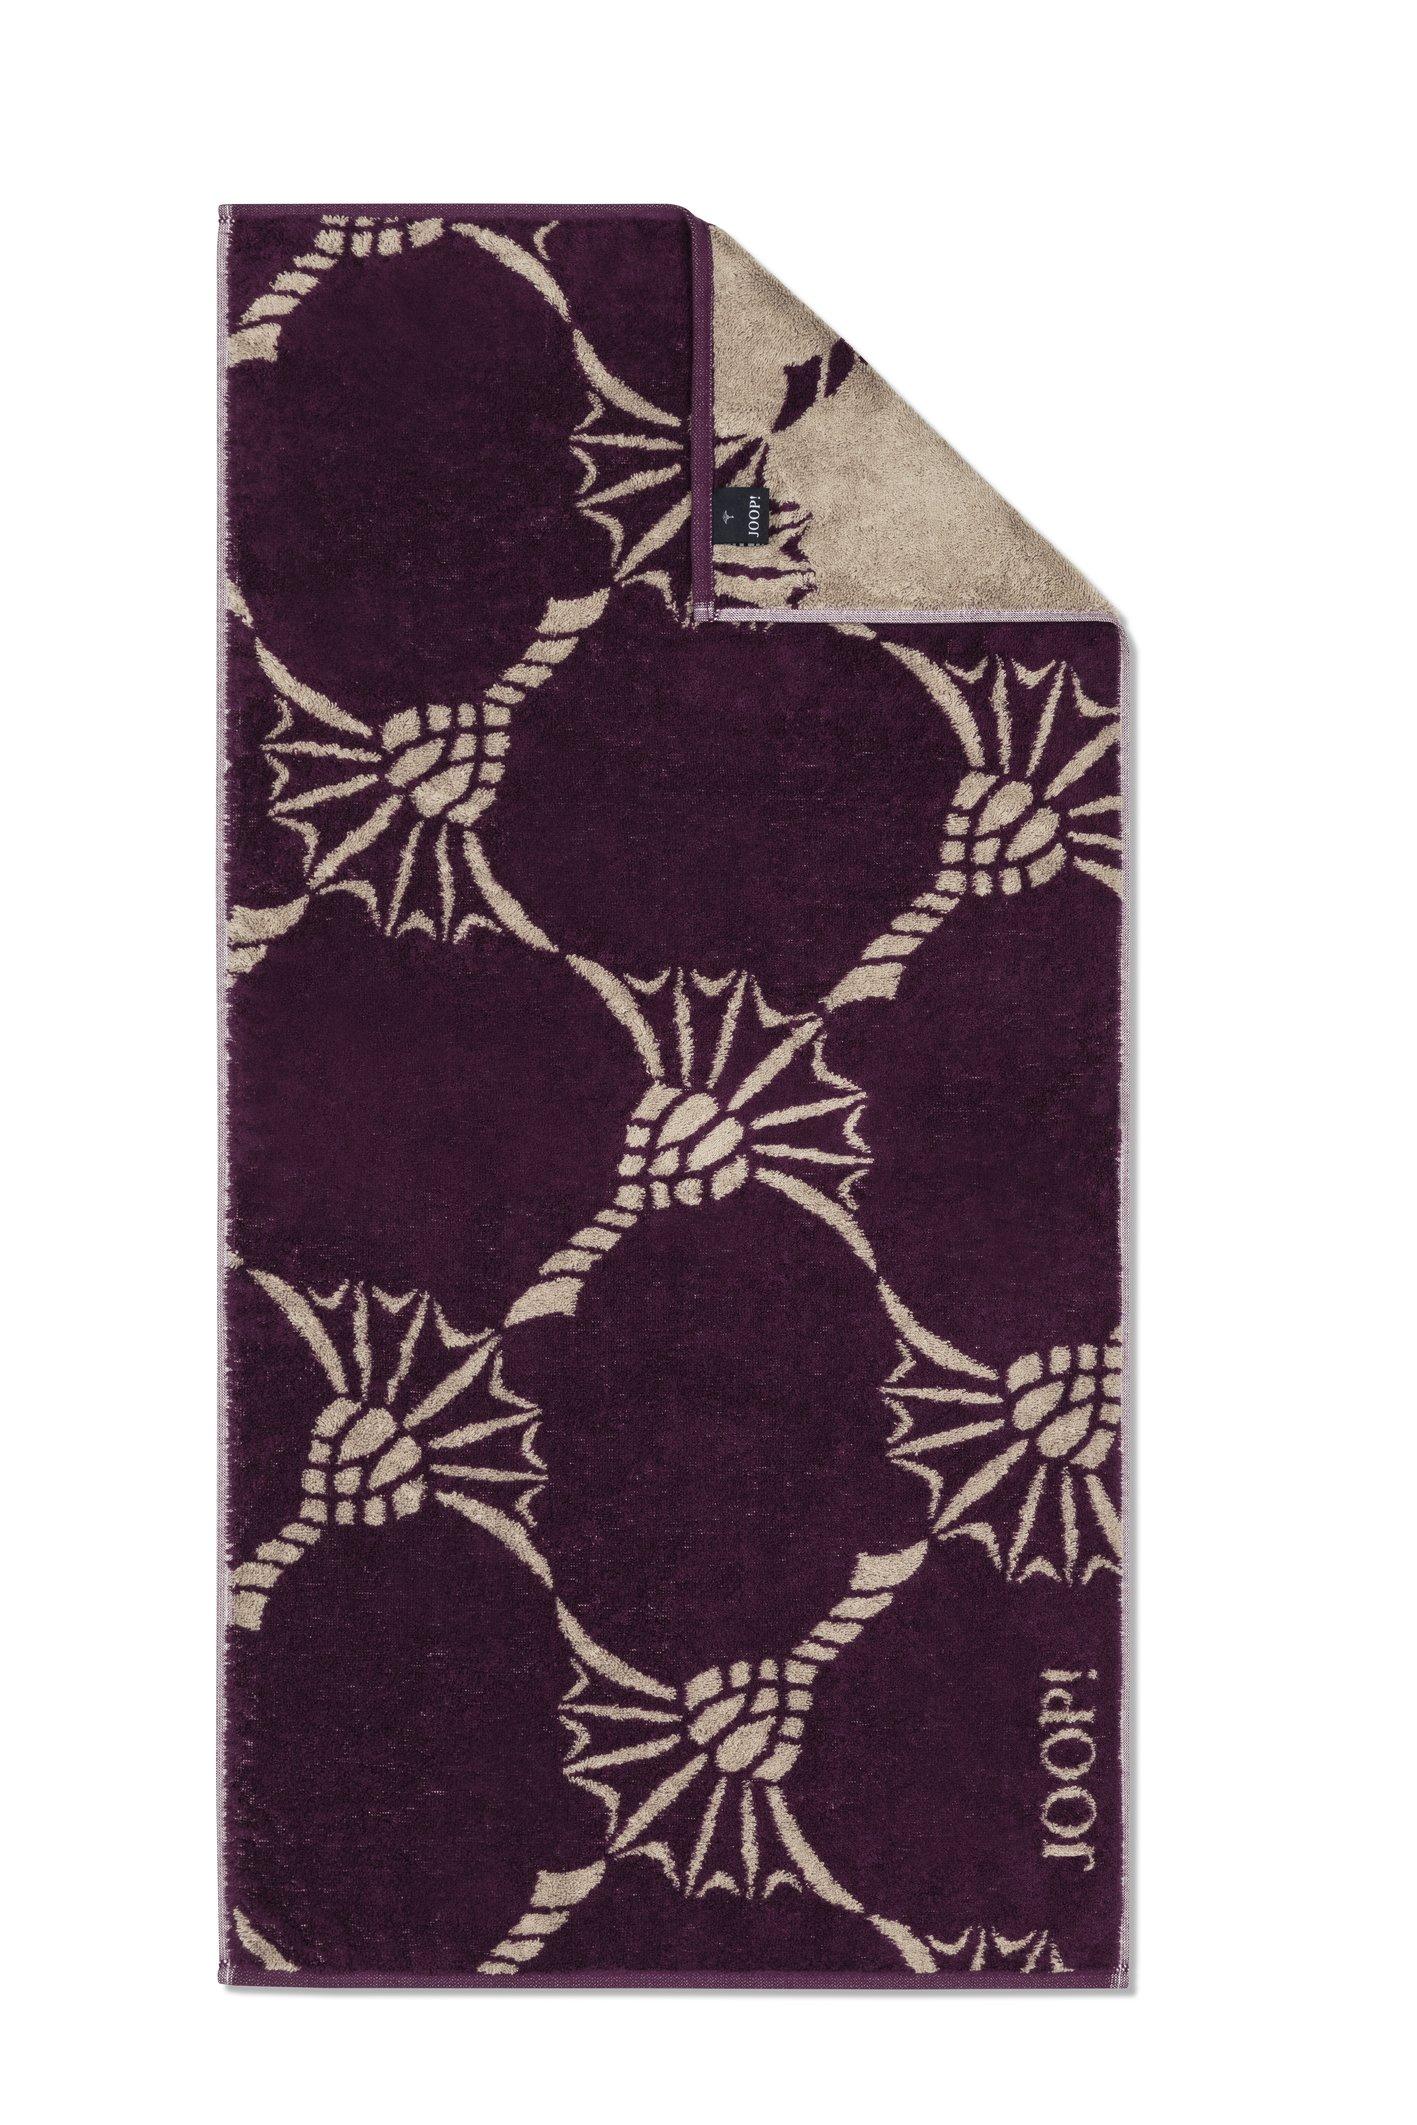 JOOP! Frottierkollektion Infinity Cornflower Zoom 1677-83 Plum Handtuch 50x100 cm